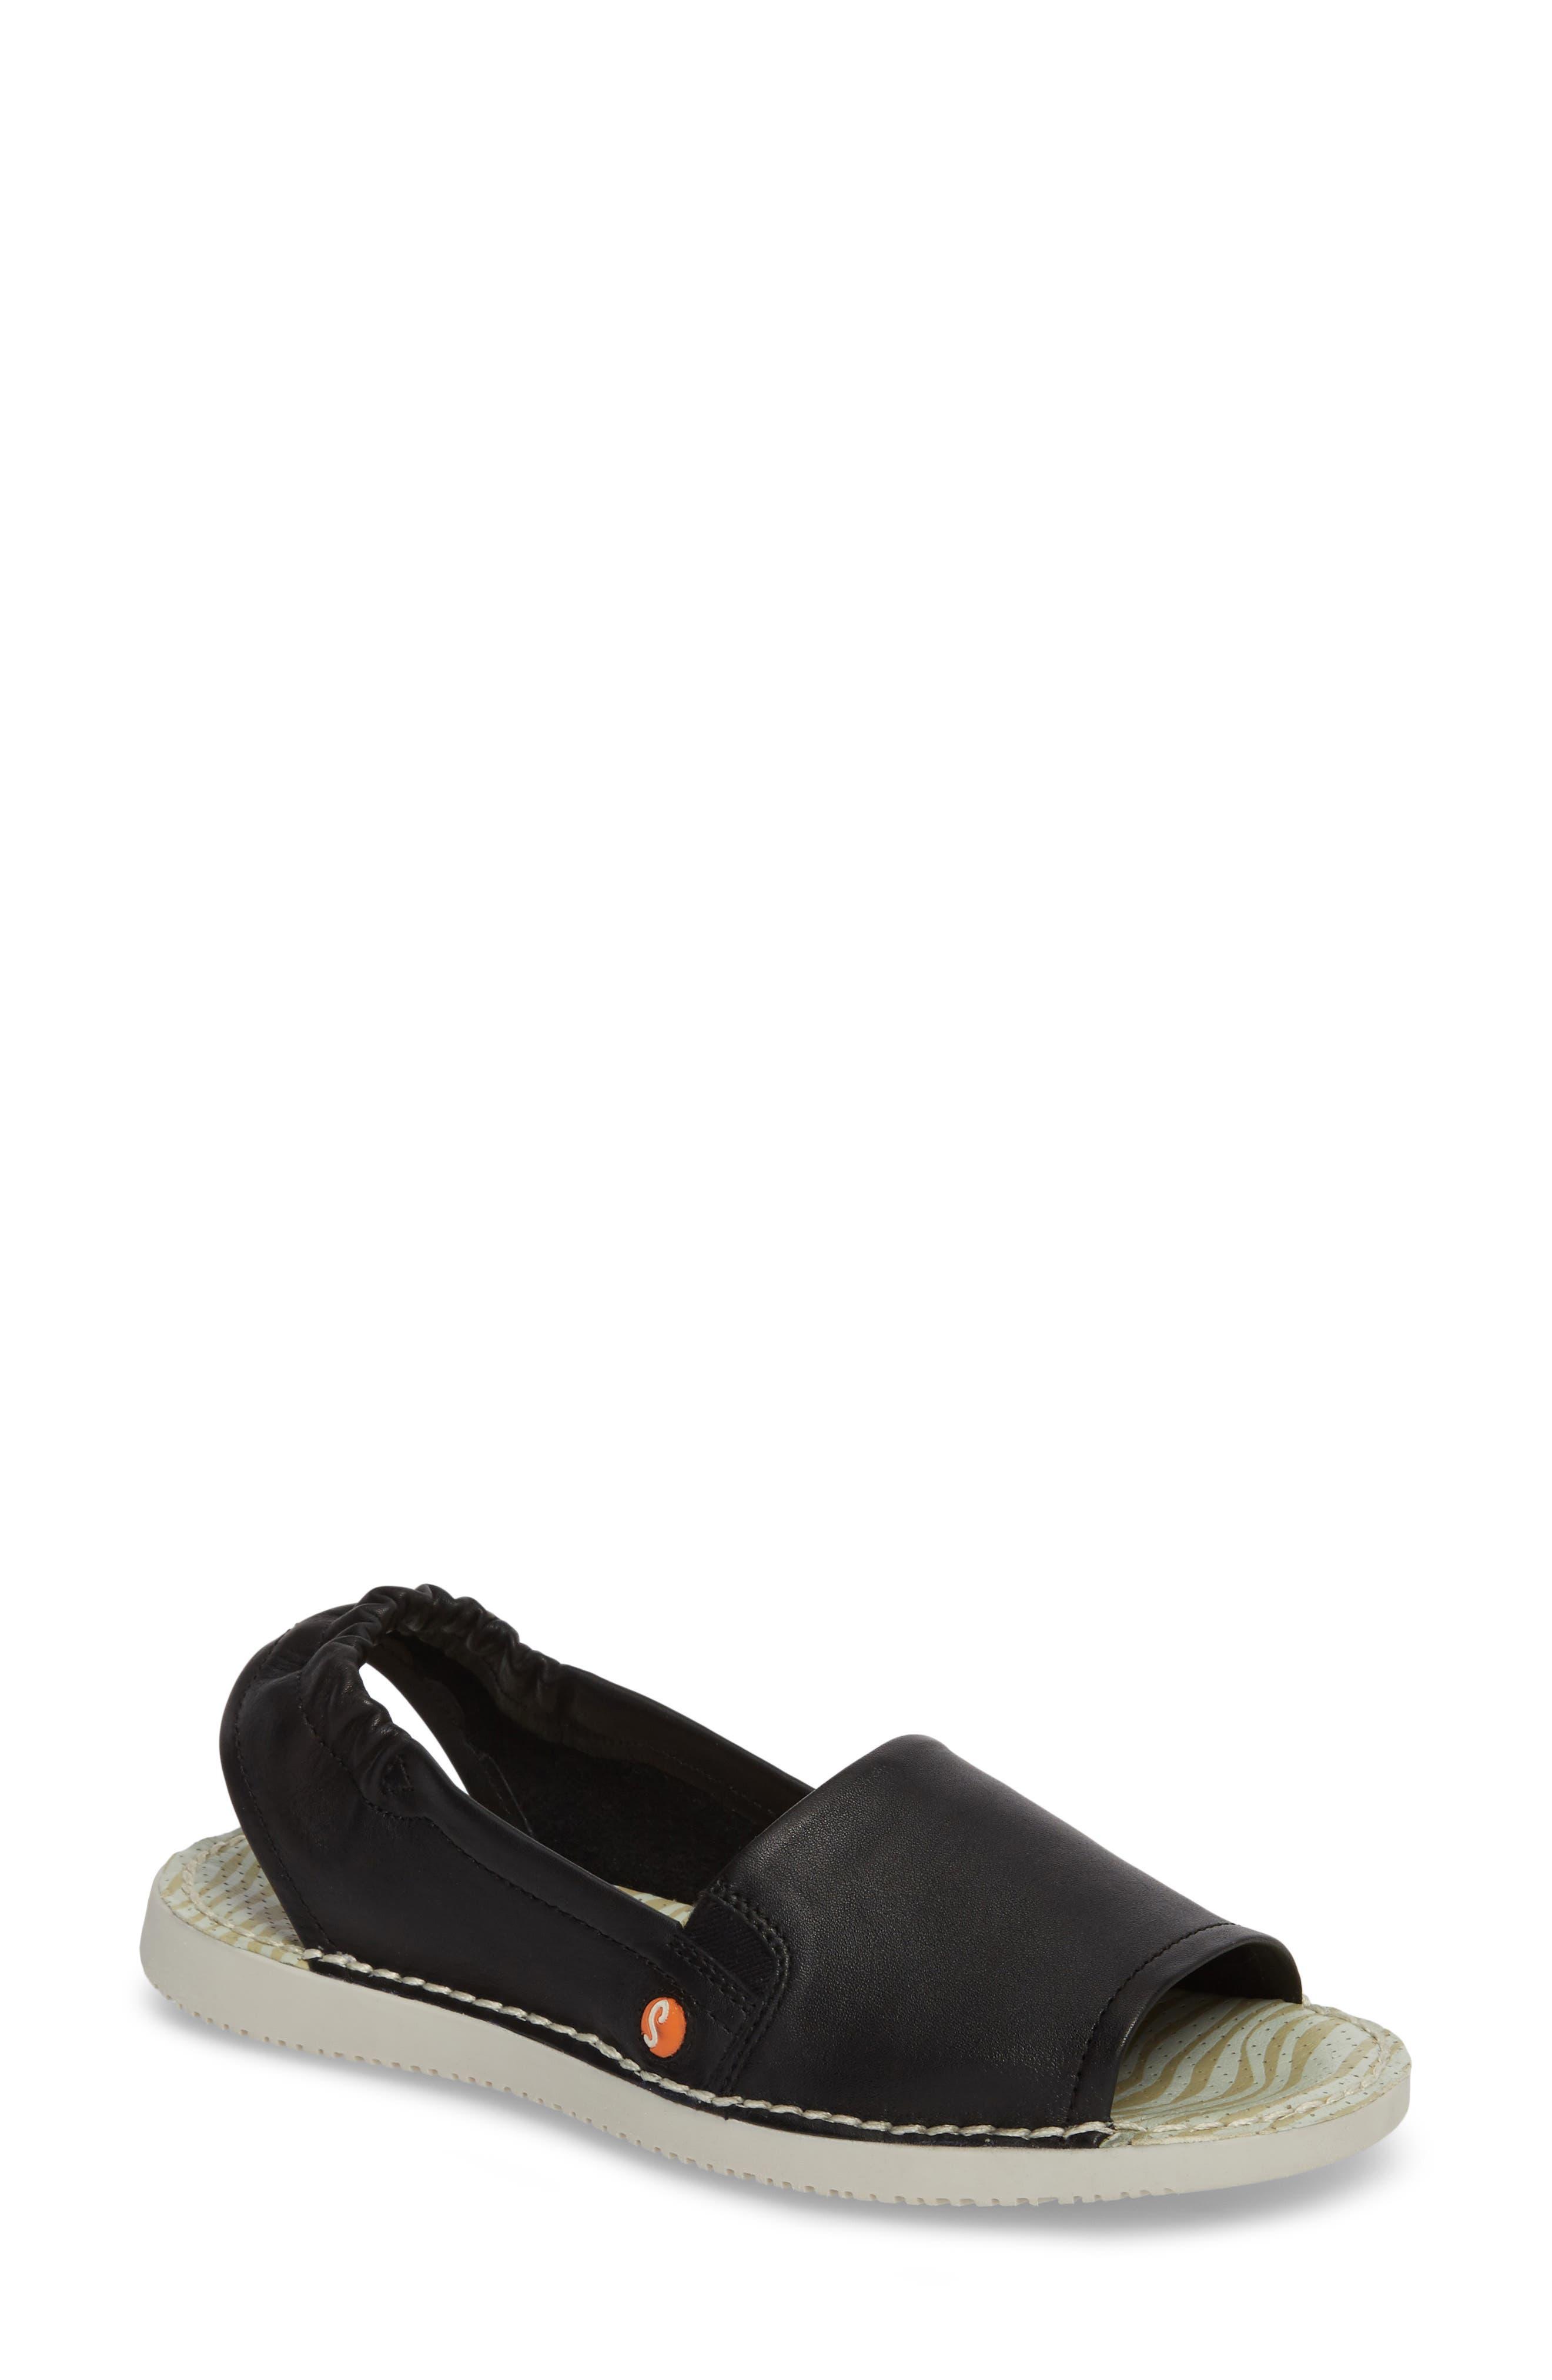 43ece9ae454 Softinos By Fly London Tee Flat Sandal - Black